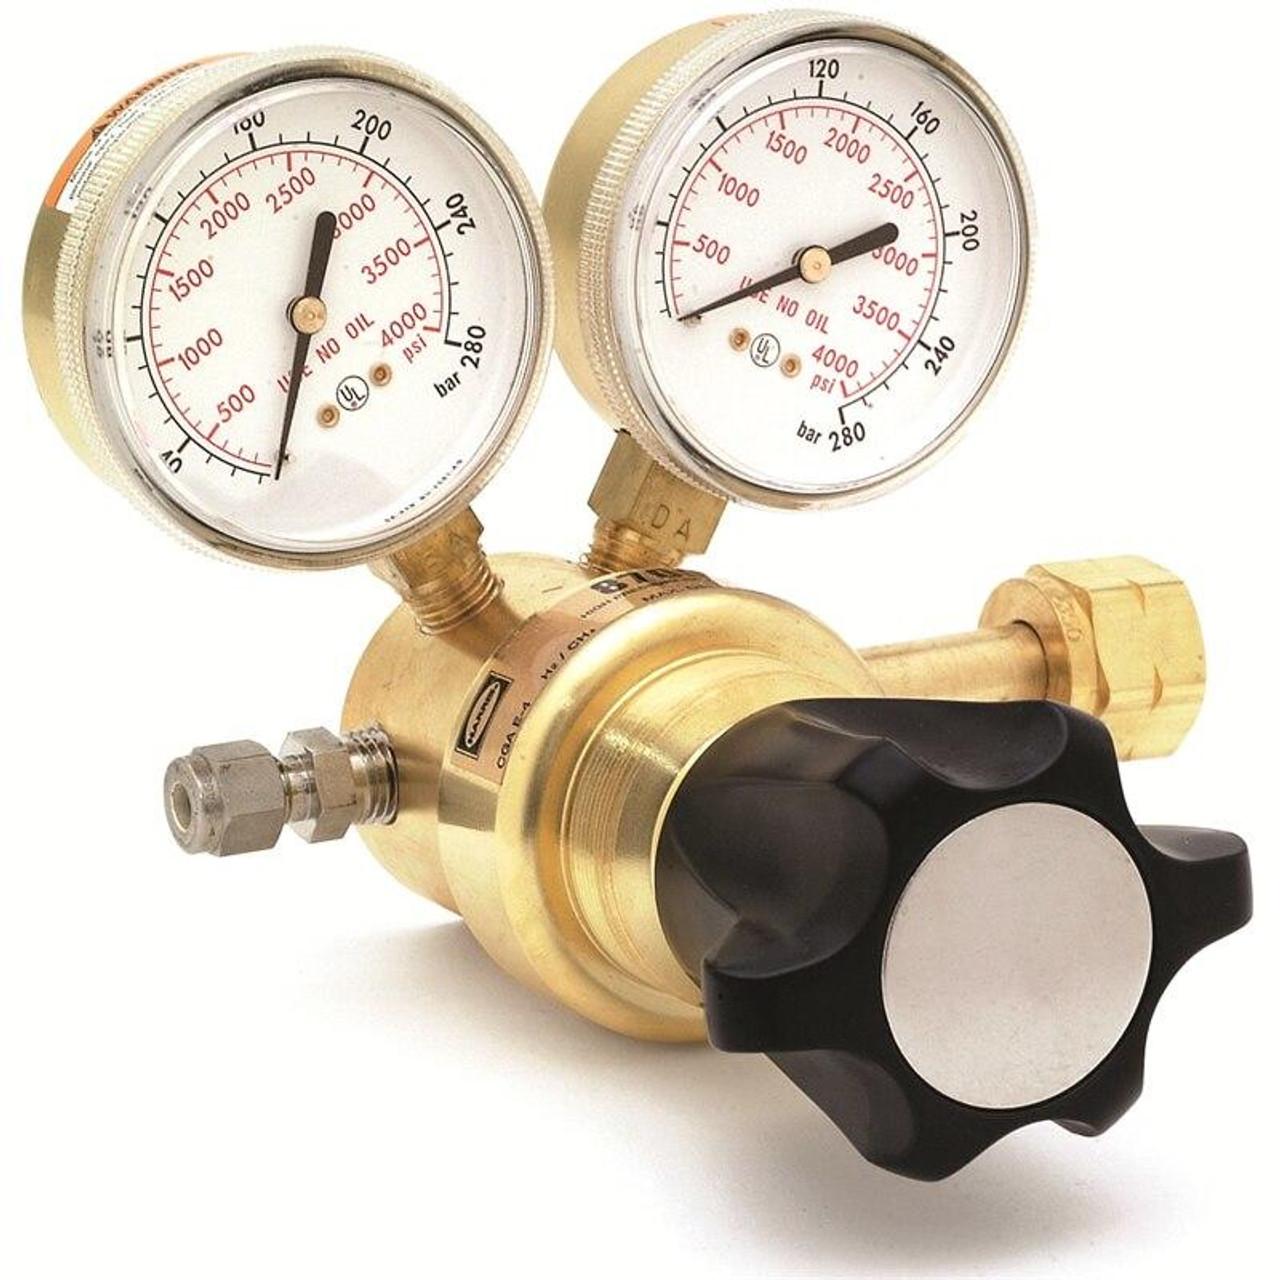 Harris Model 8700-3000-677 Argon, Helium, Nitrogen Ultra High Delivery Pressure Regulator - 3200321